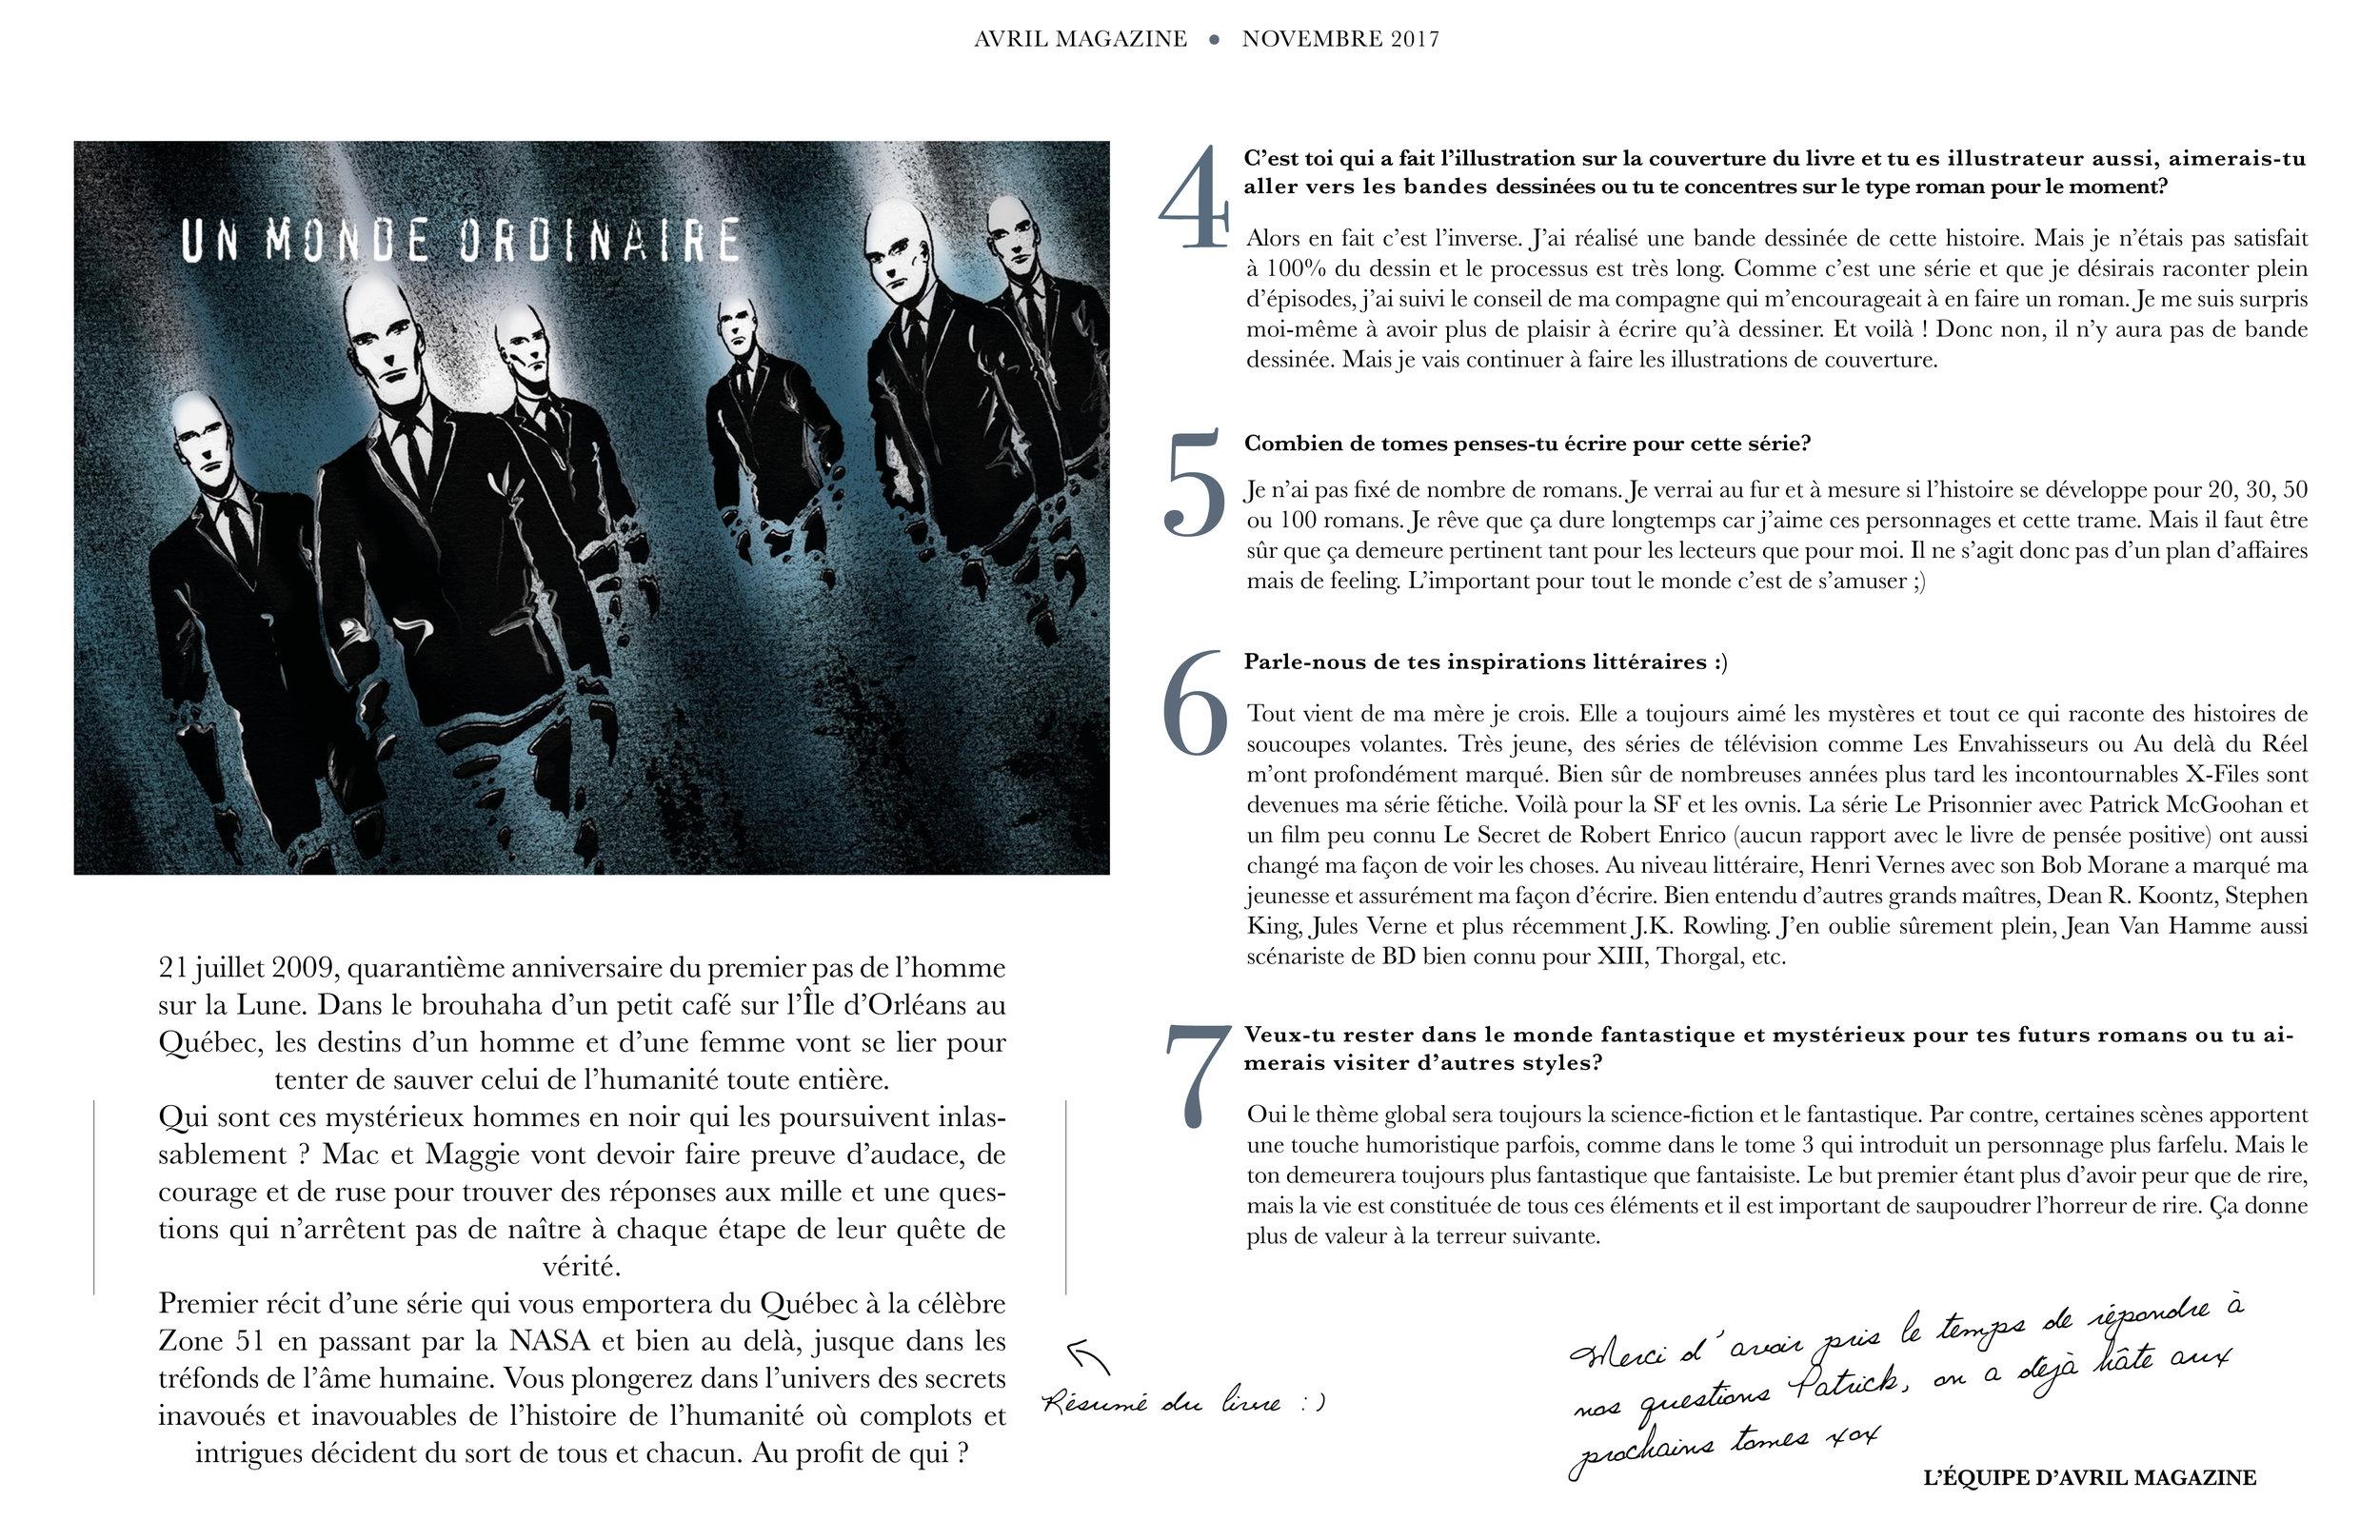 chronique-livre-papa2.jpg